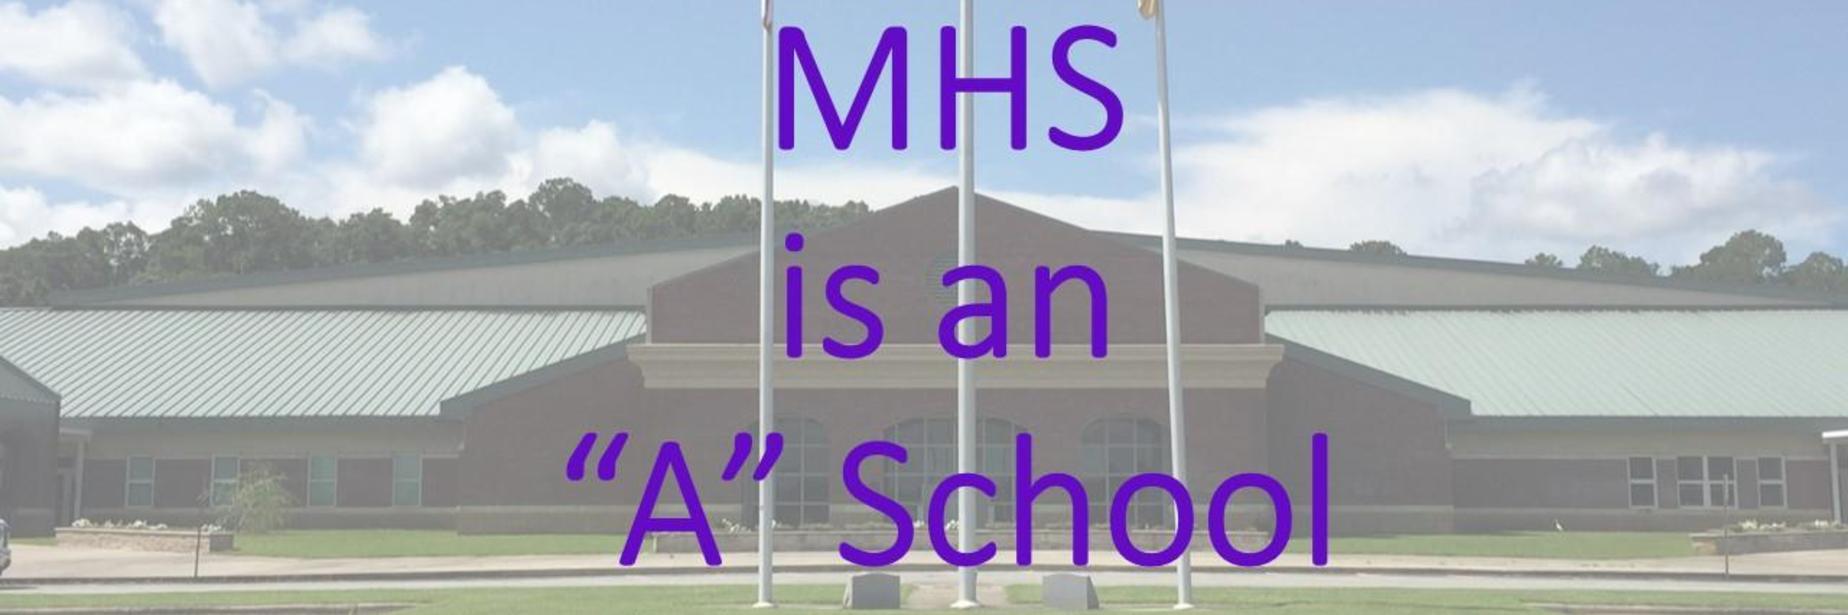 mhs is an a school